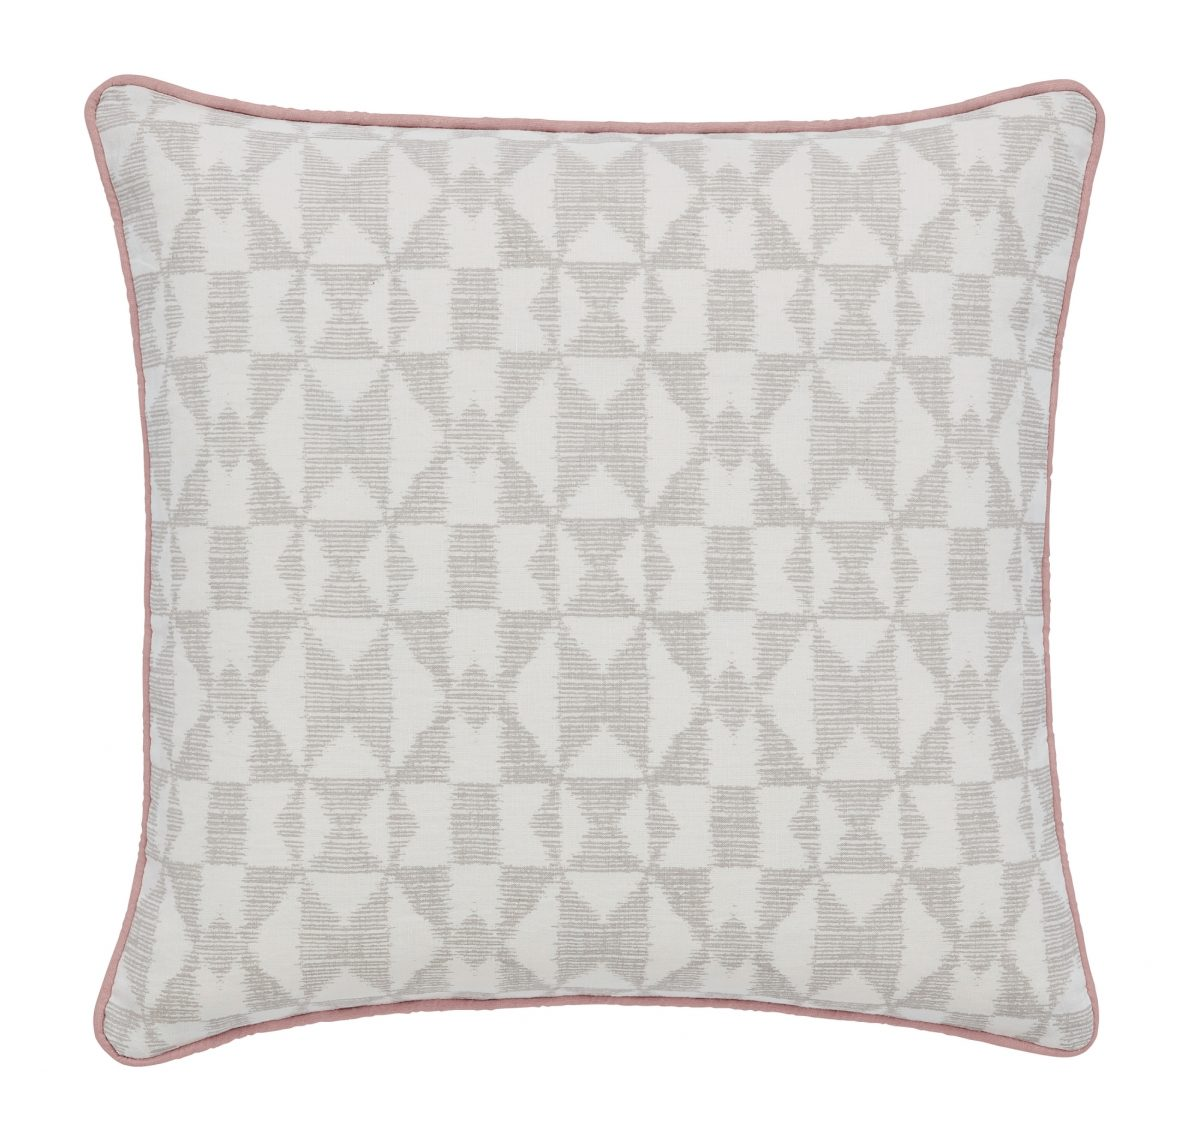 BEDECK OF BELFAST Kala cushion co